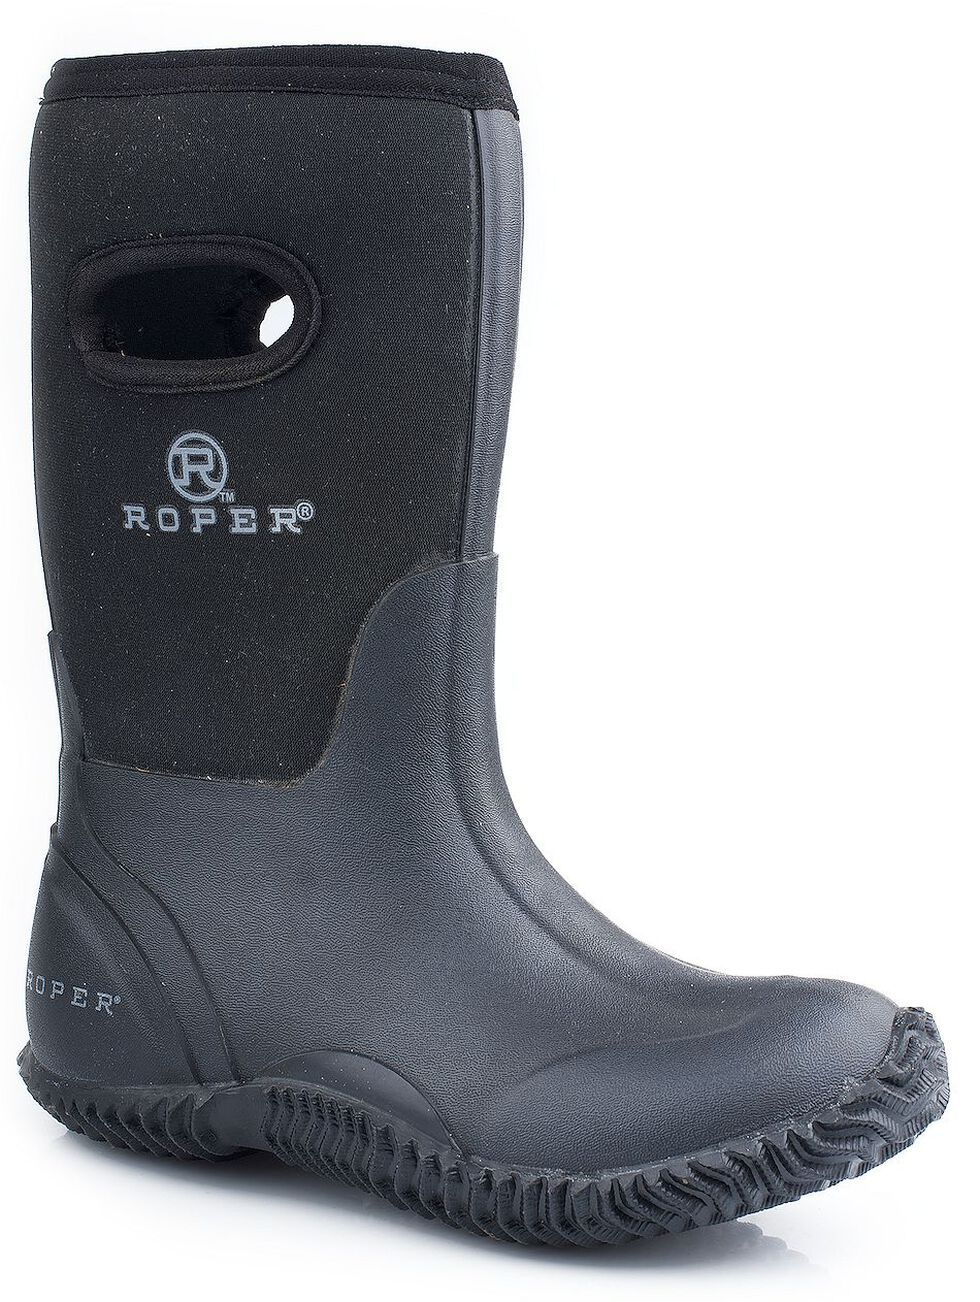 Roper Boys' Black Neoprene Boots, Black, hi-res